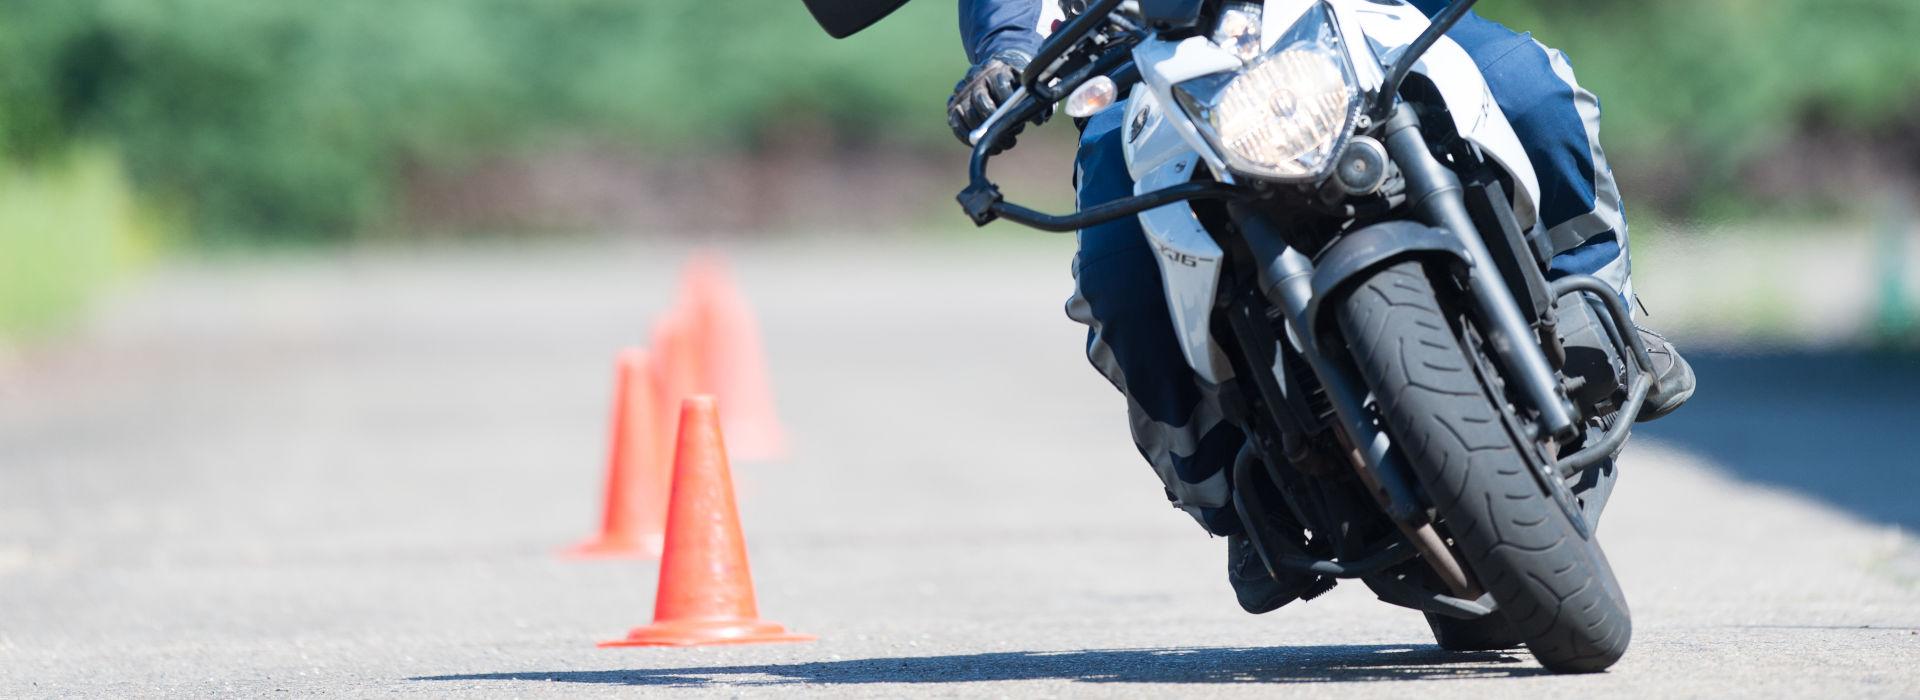 Motorrijbewijspoint Arnhem motor rijvaardigheid